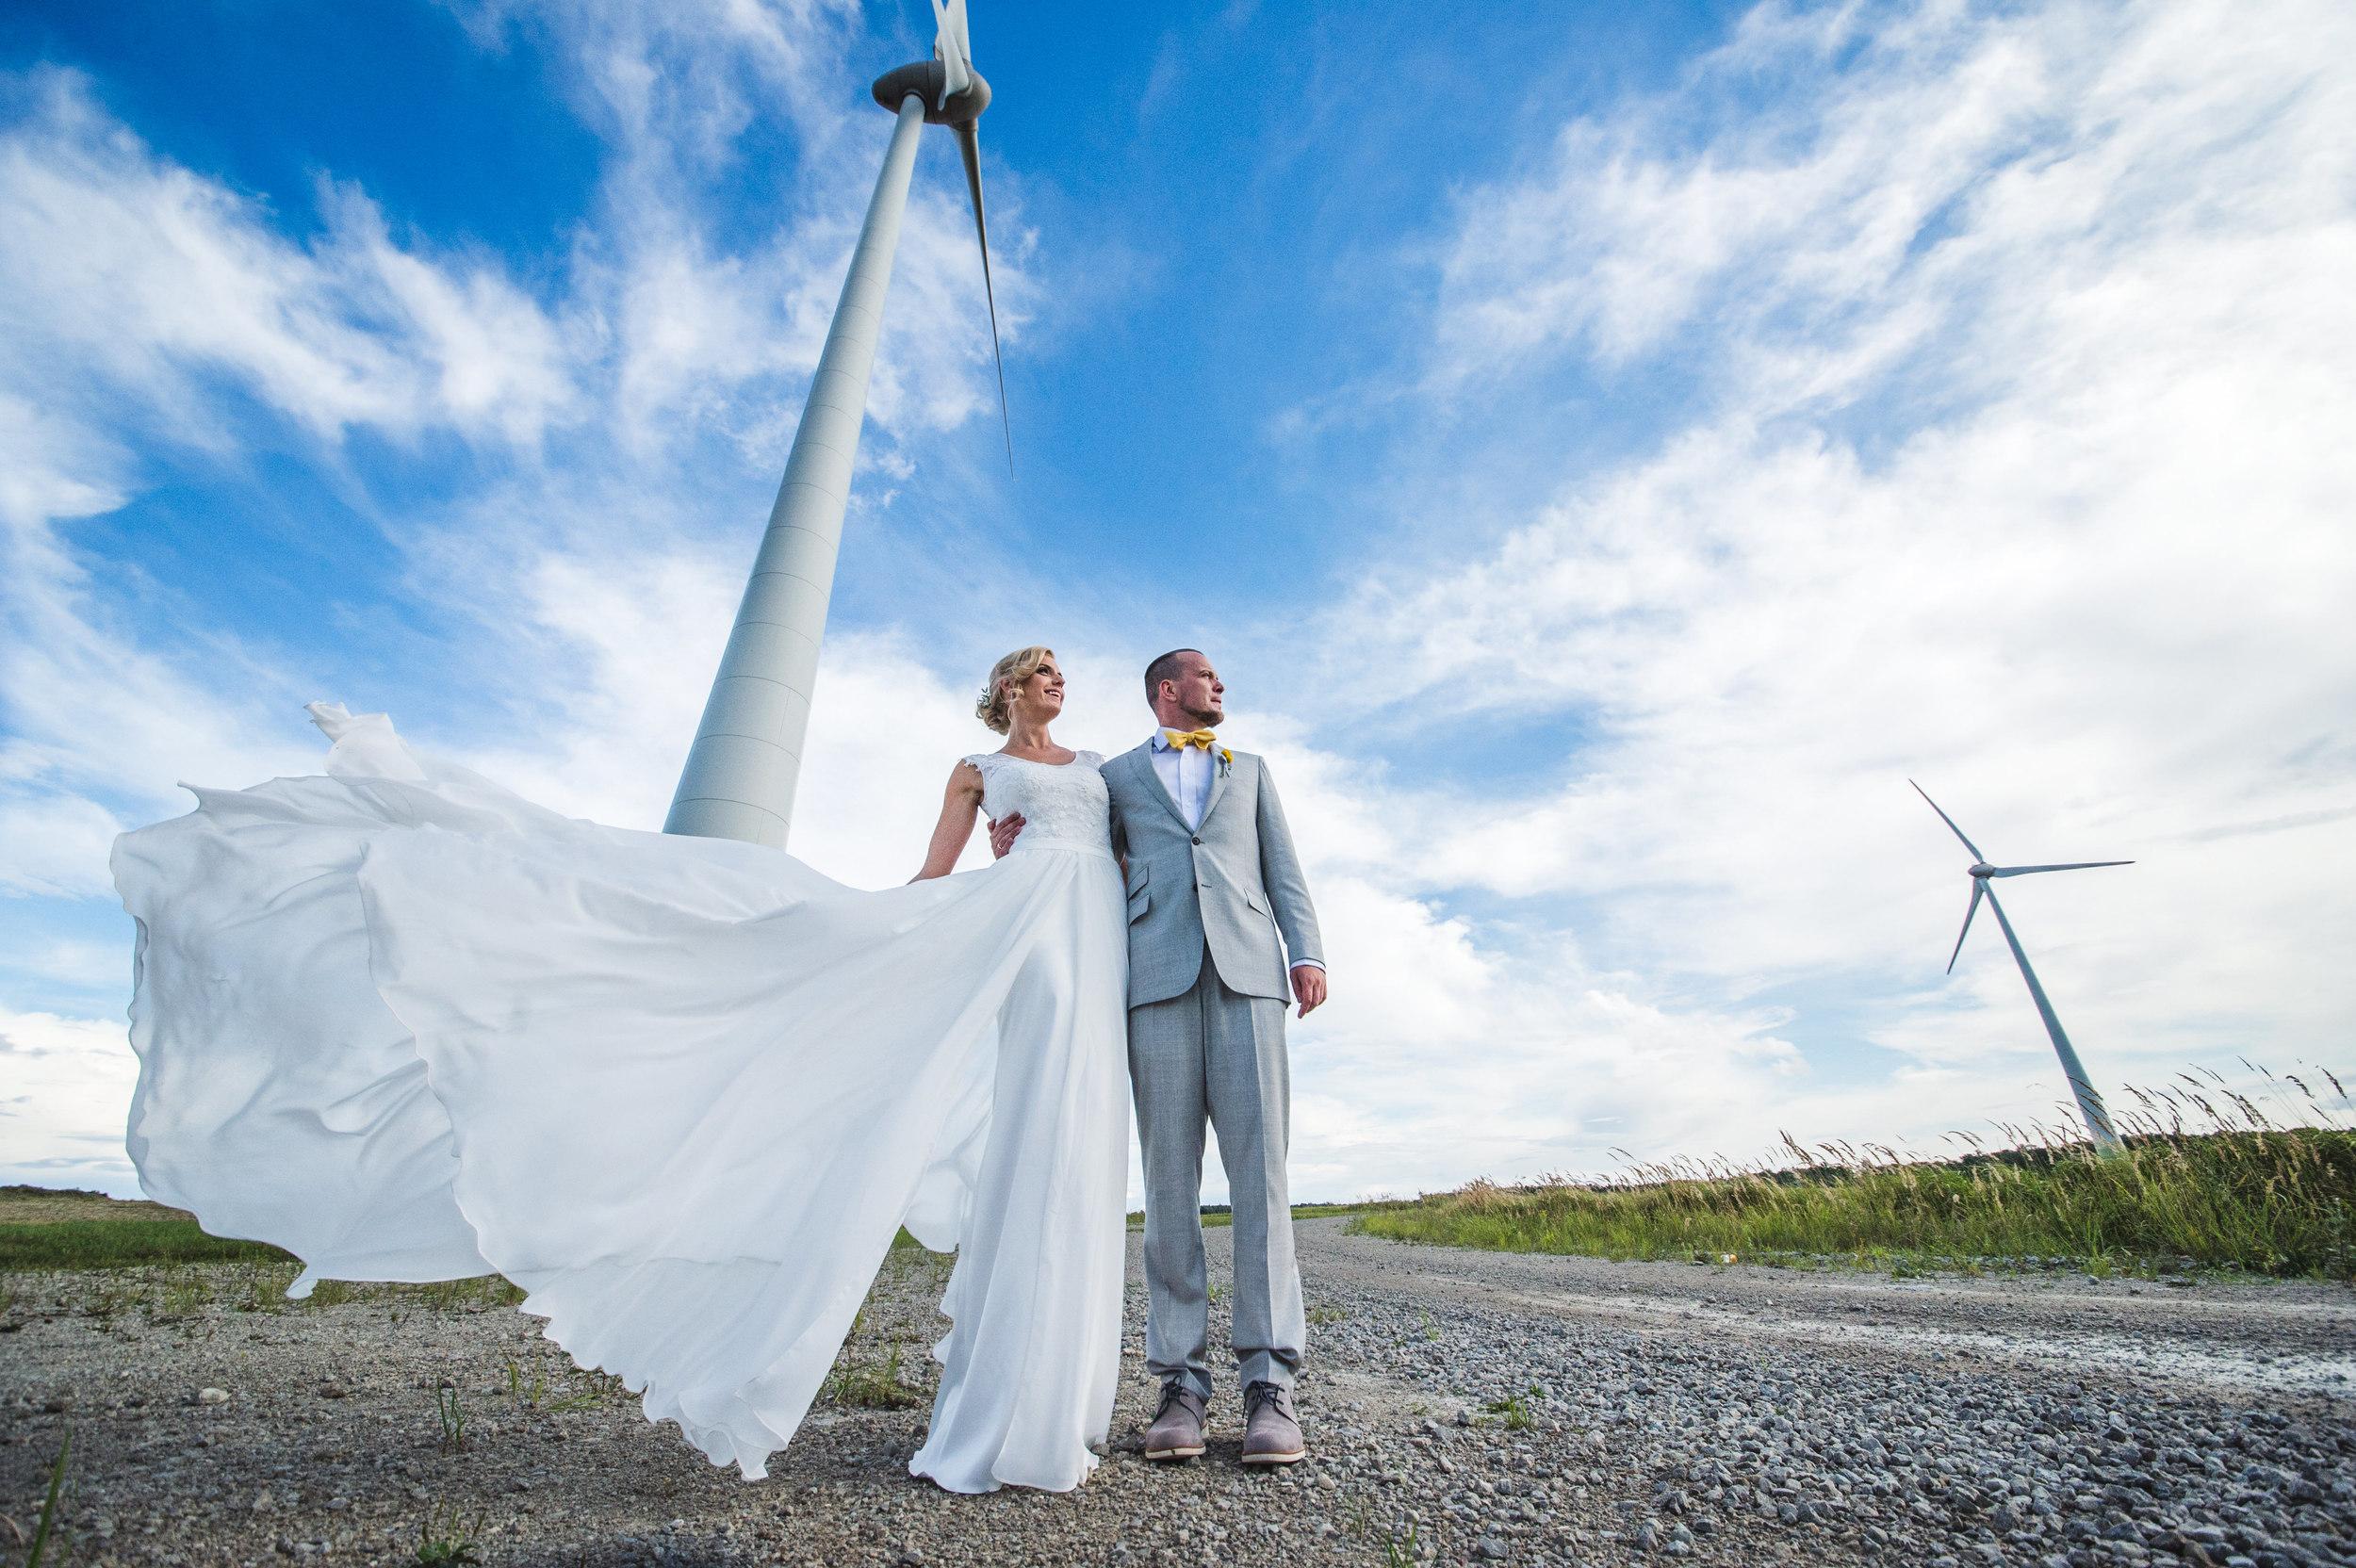 Destination Creative Wedding Photographer Mantas Kubilisnkas